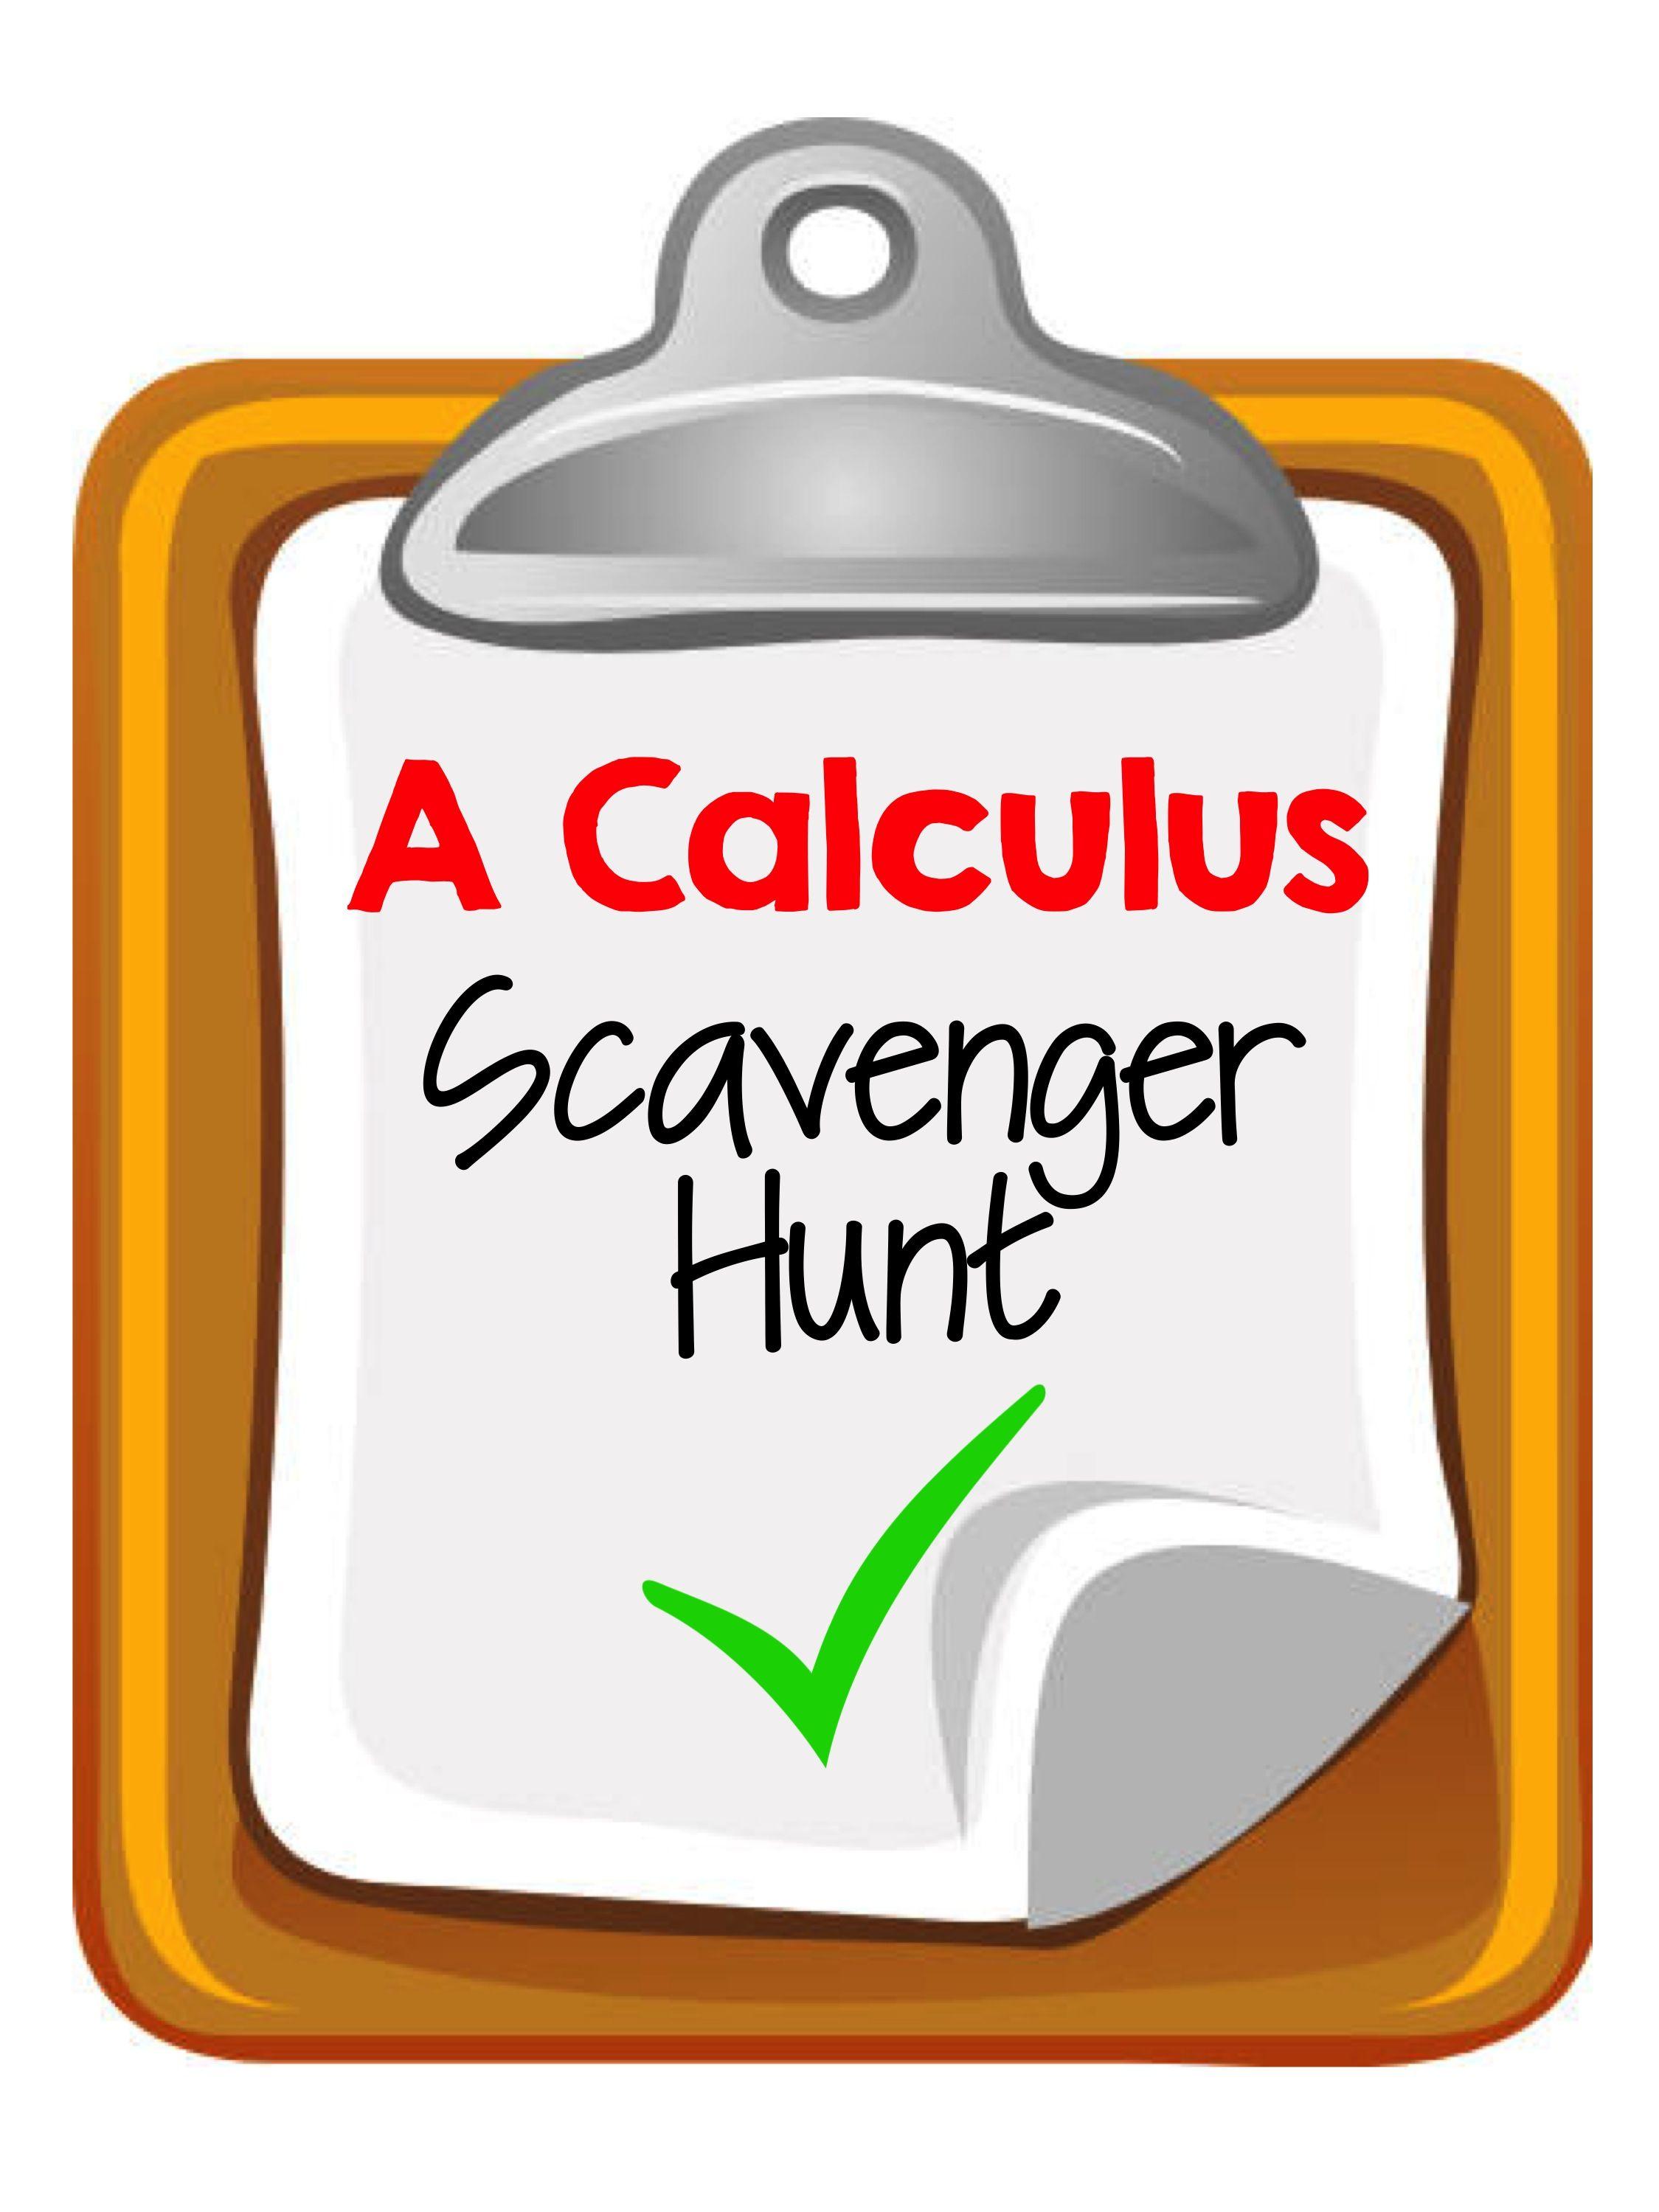 A Calculus Scavenger Hunt